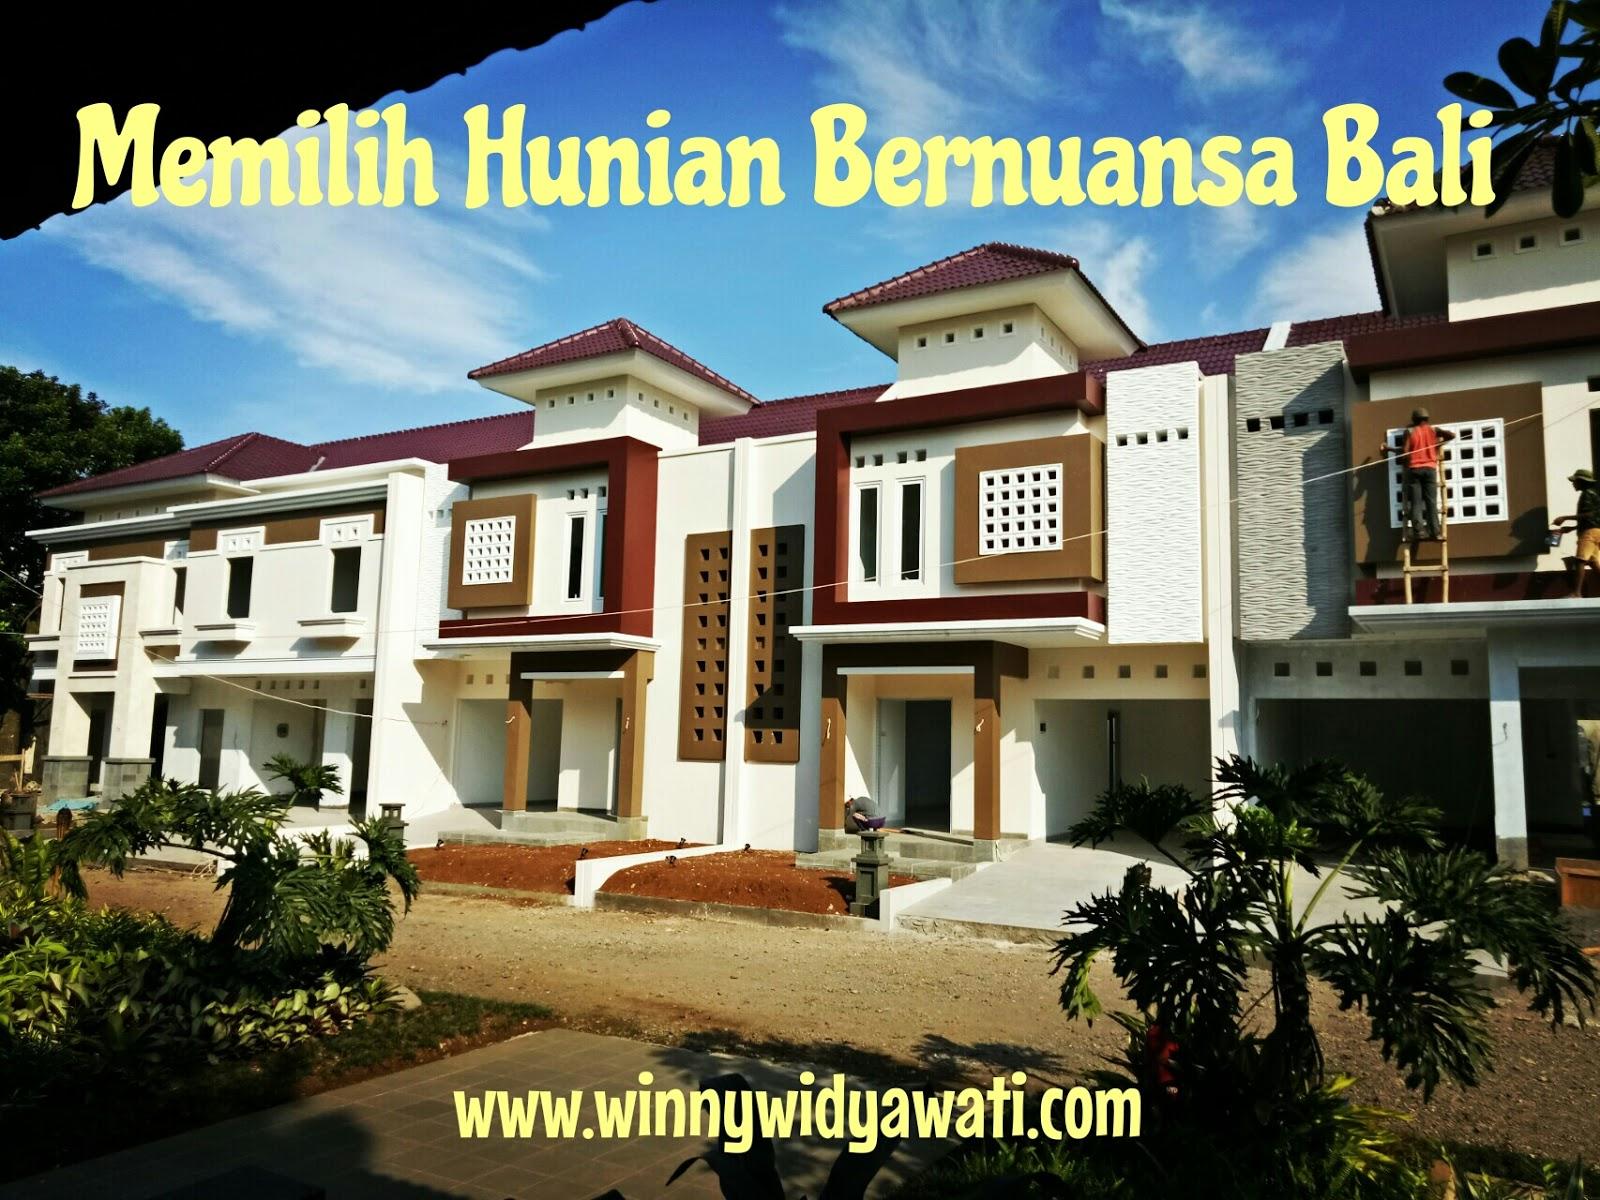 Goresan Winny Tips Memilih Hunian Bernuansa Bali